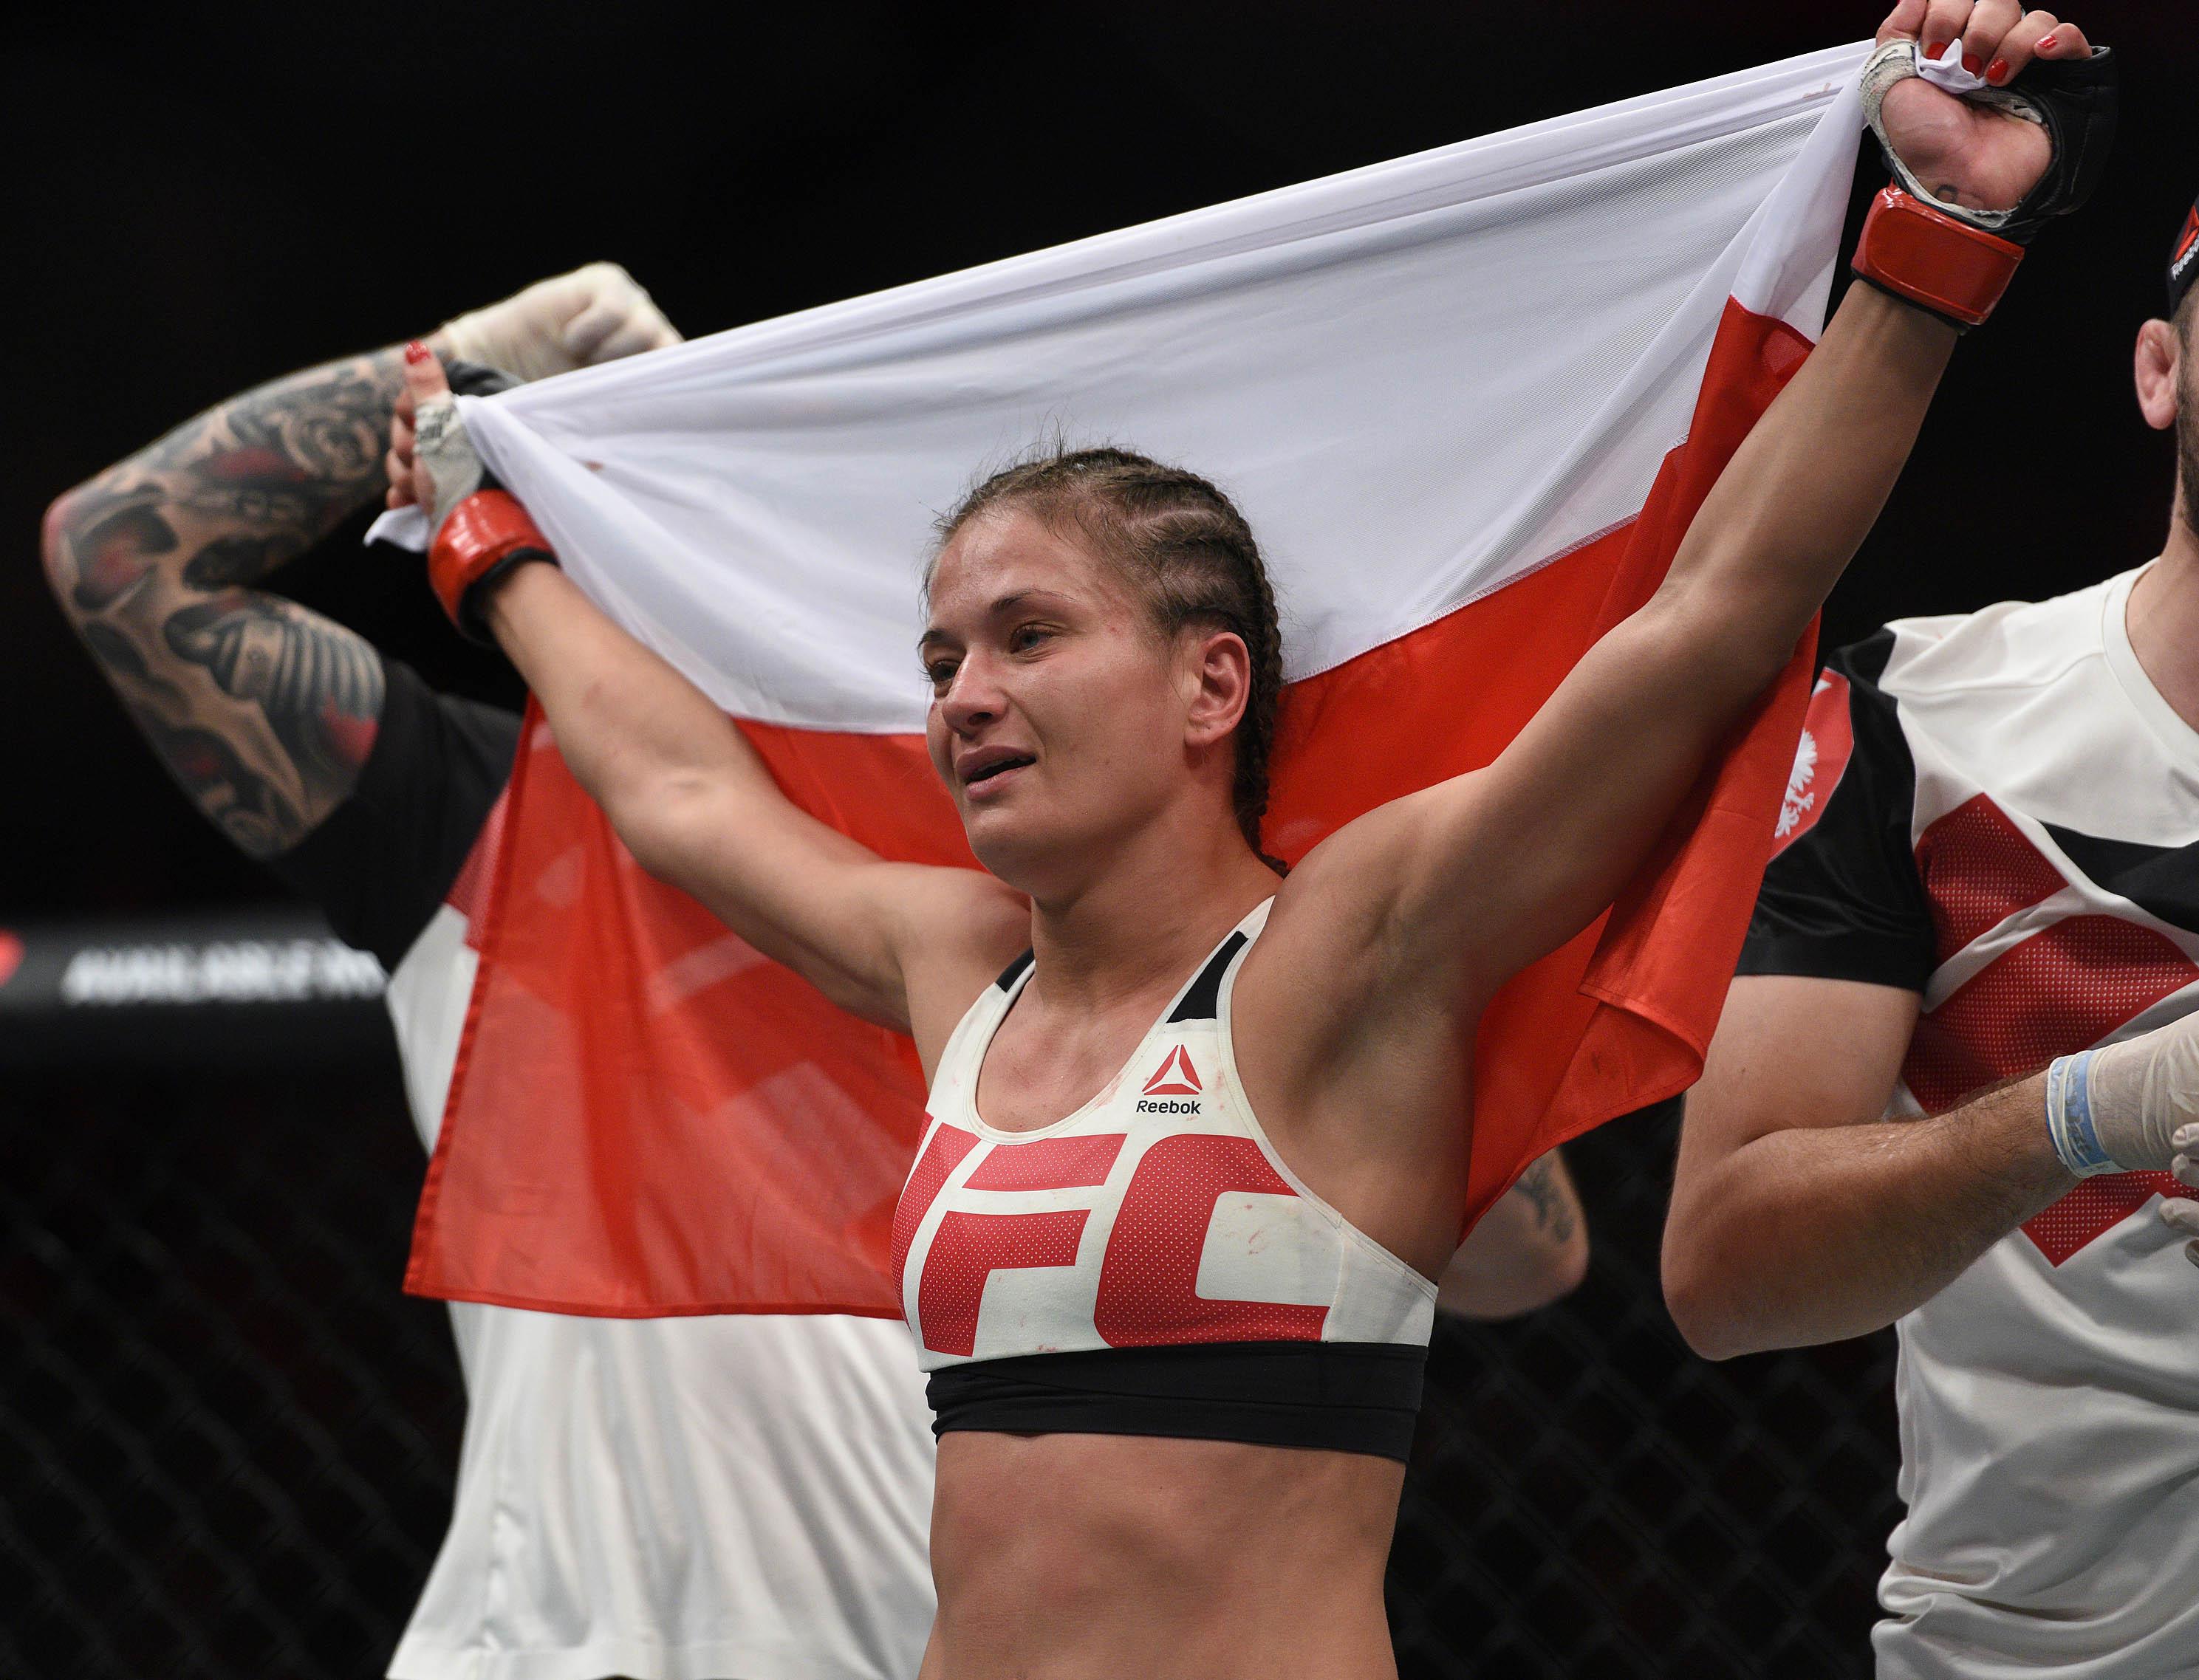 MMA: UFC Fight Night-Kowalkiewicz vs Clark